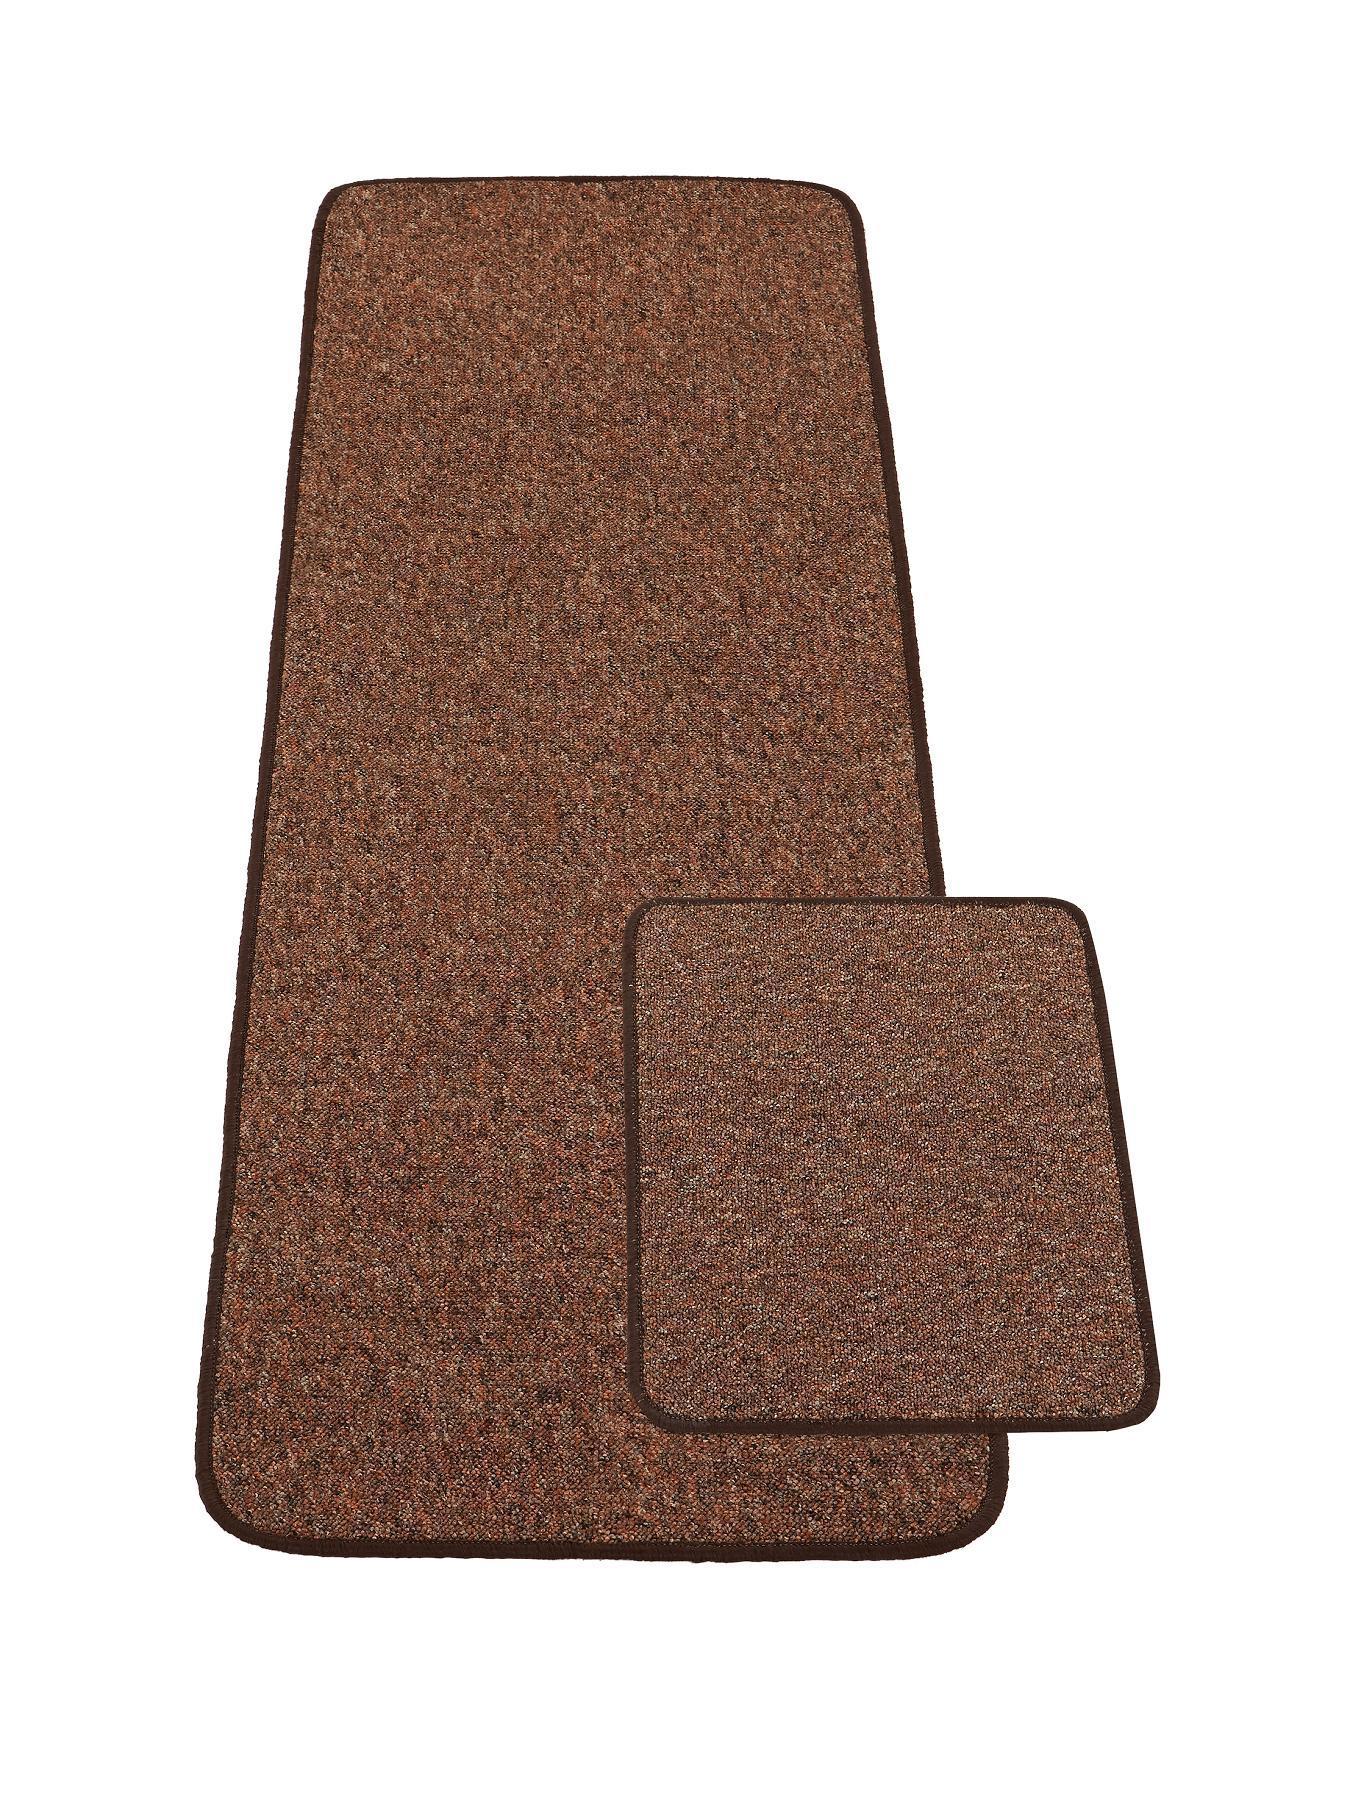 York Tweed Mat With Free Door Mat, Red,Chocolate,Charcoal.